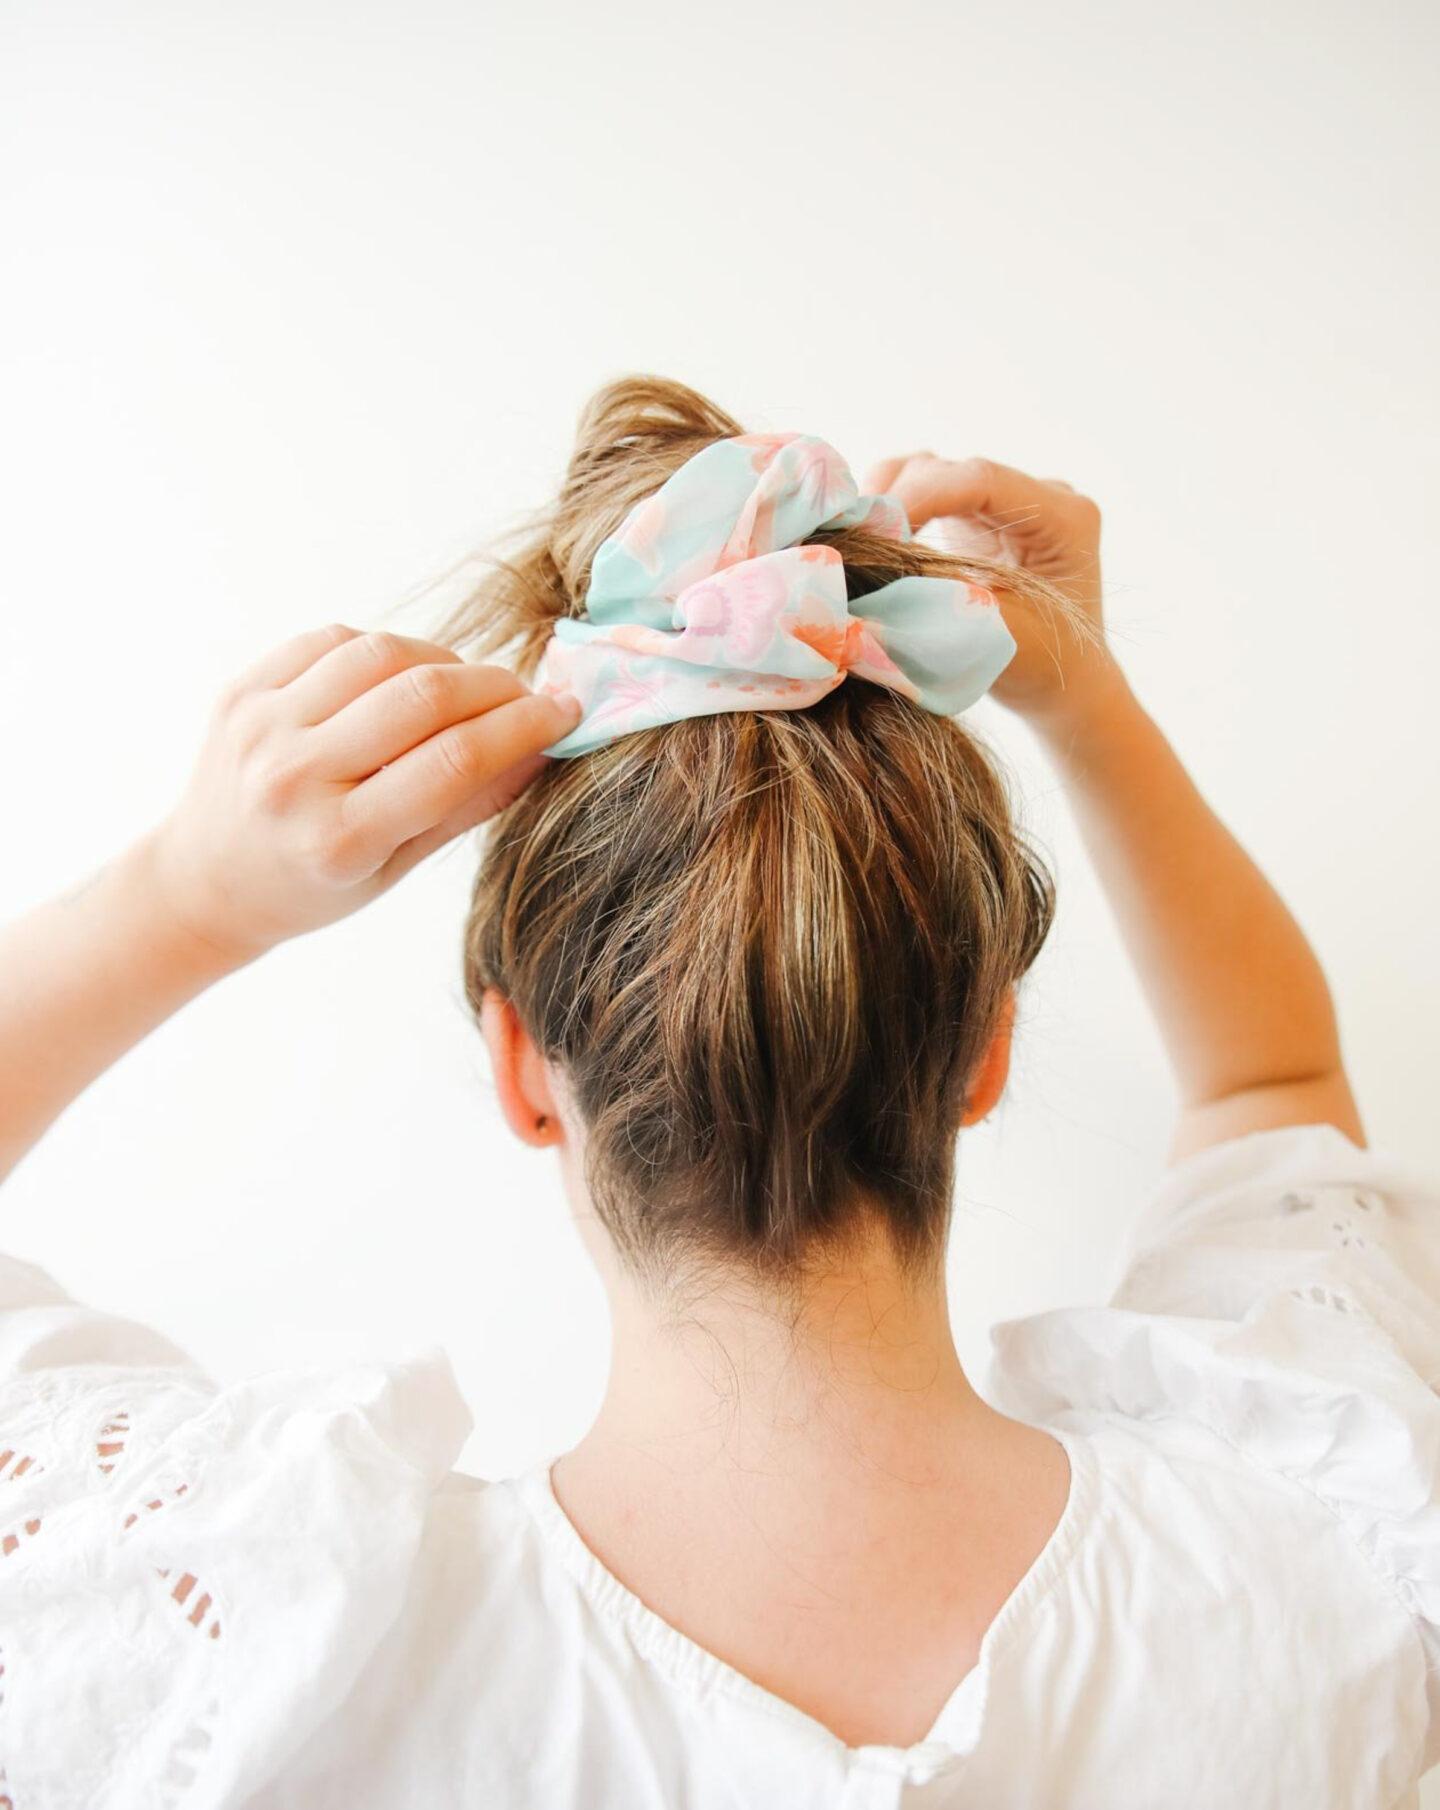 Colourful scrunchies